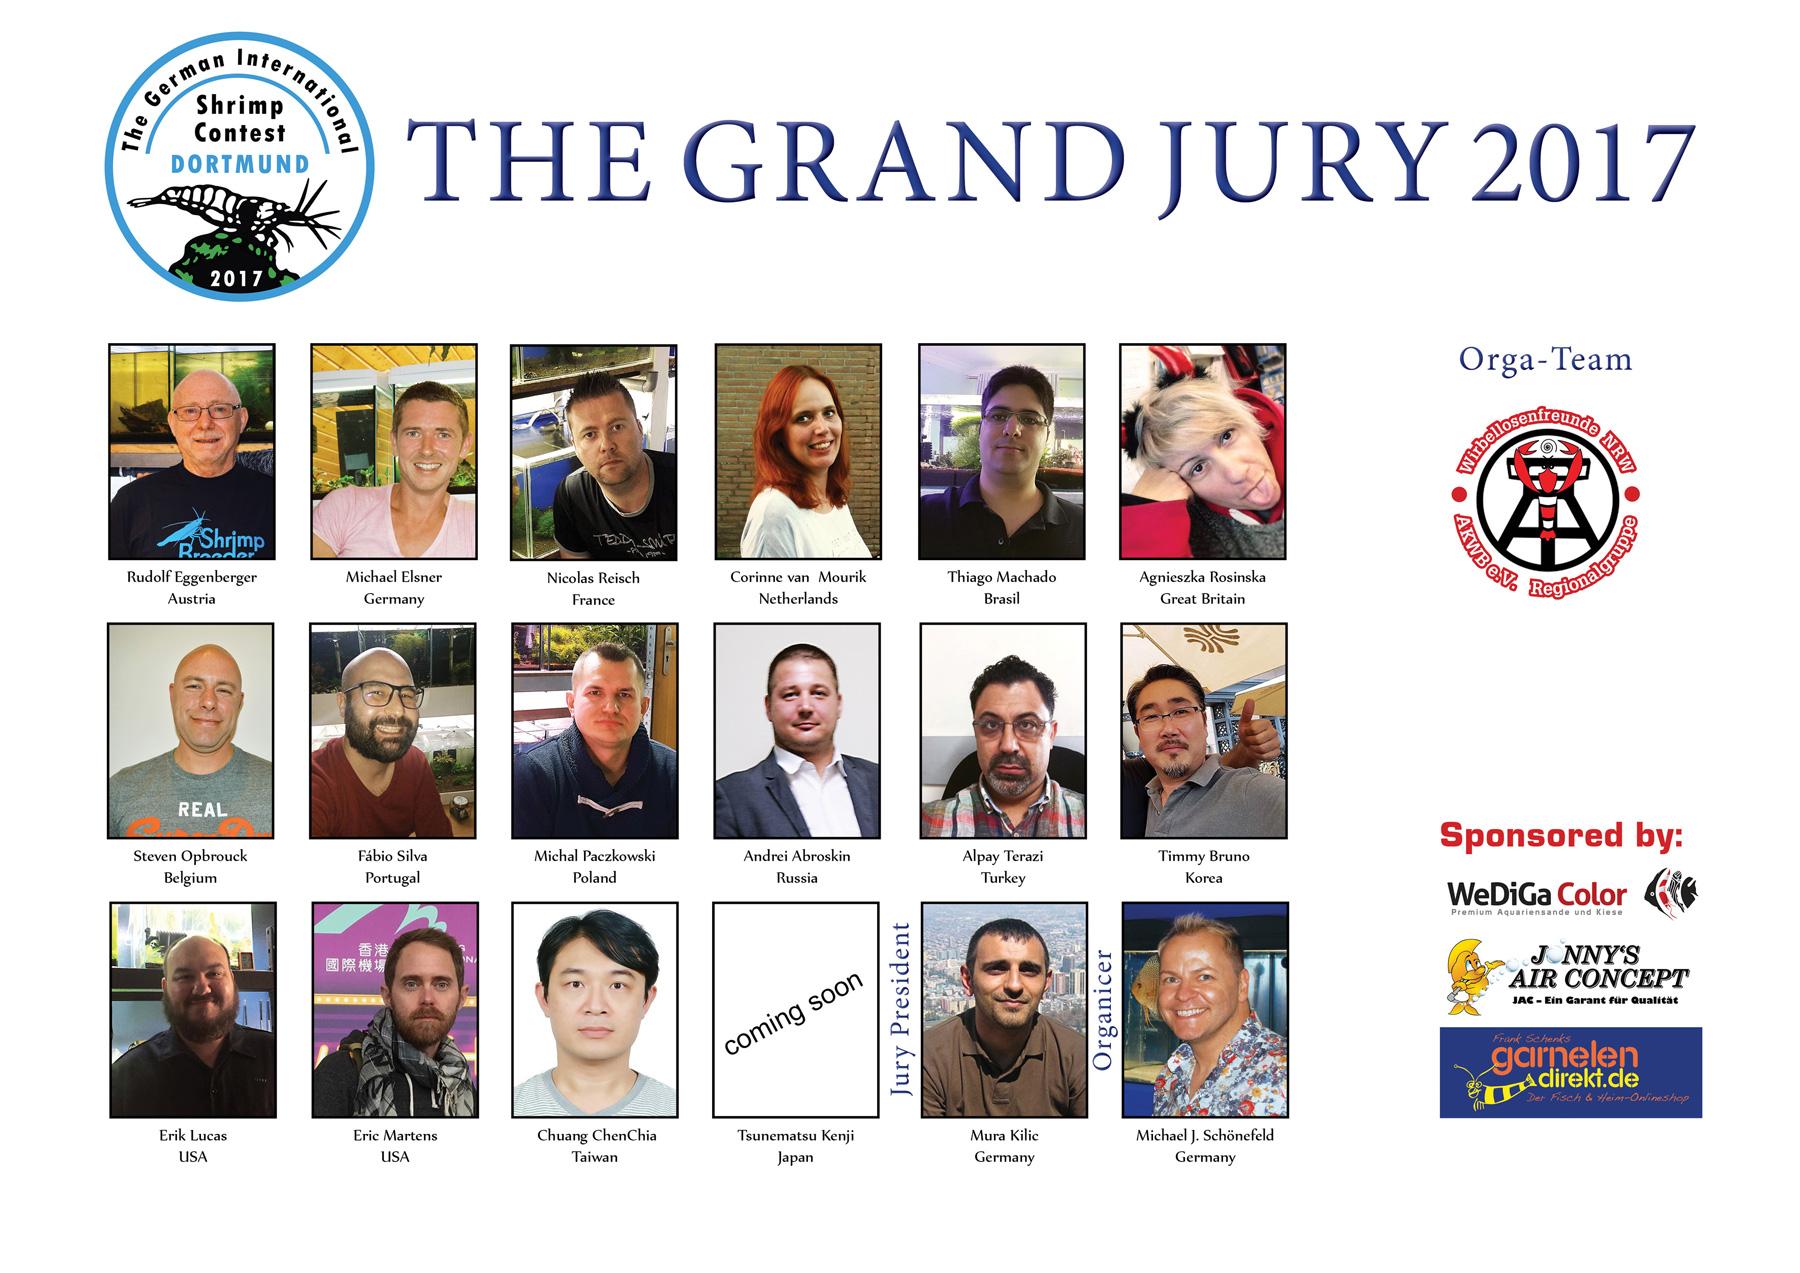 TGISC - The Grand Jury 2017 - aqua EXPO Tage 2017